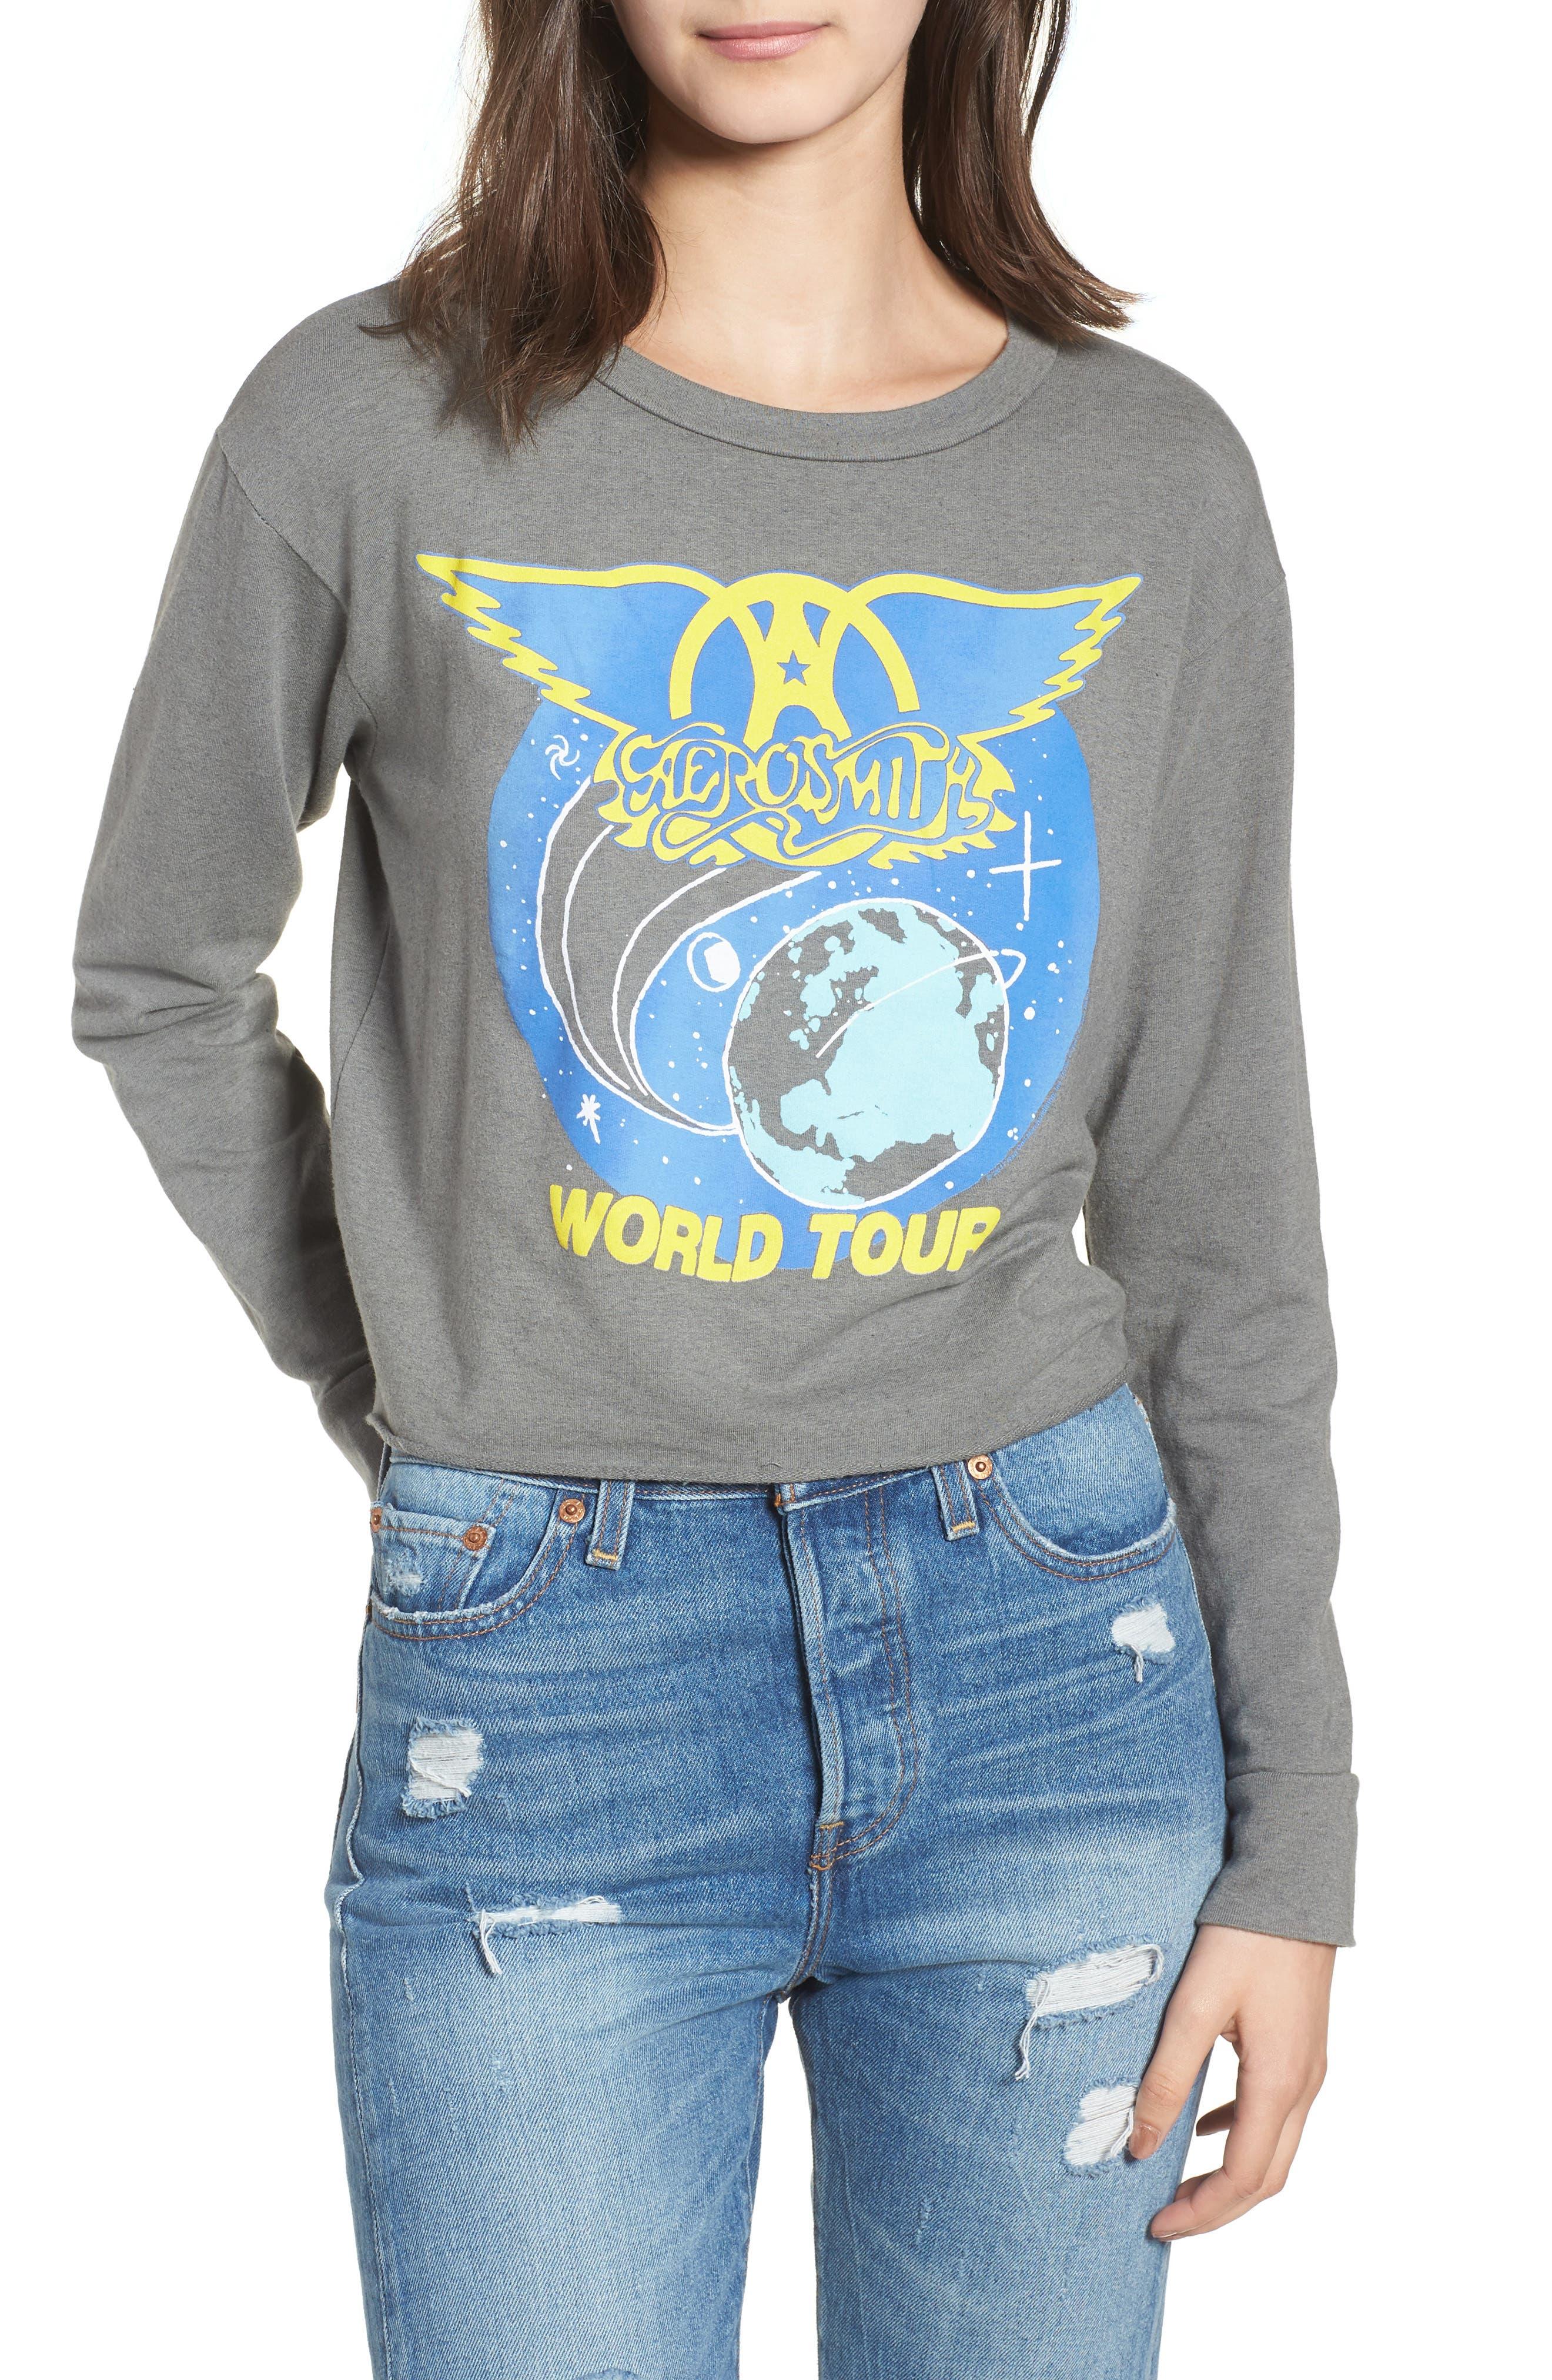 Aerosmith Sweatshirt,                             Main thumbnail 1, color,                             Clay